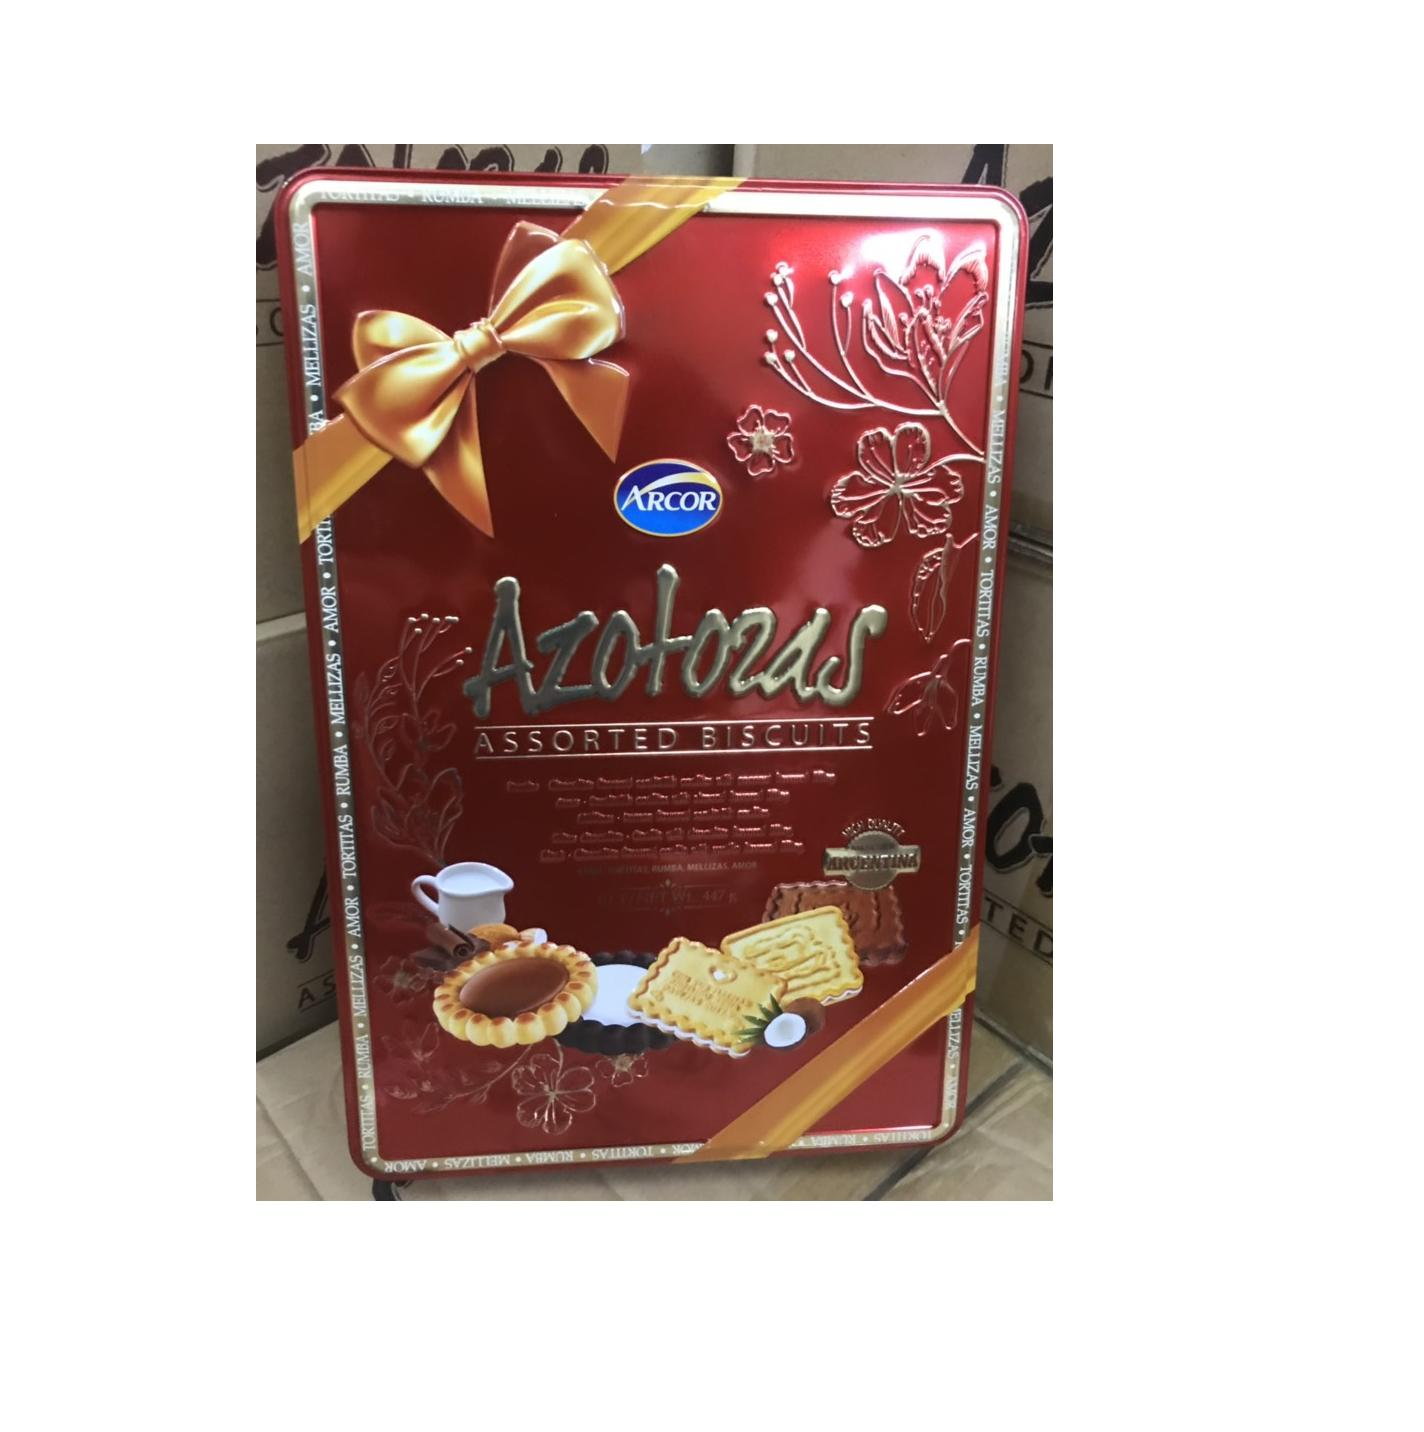 Bánh Argentina Arcor Azotozas 447g new